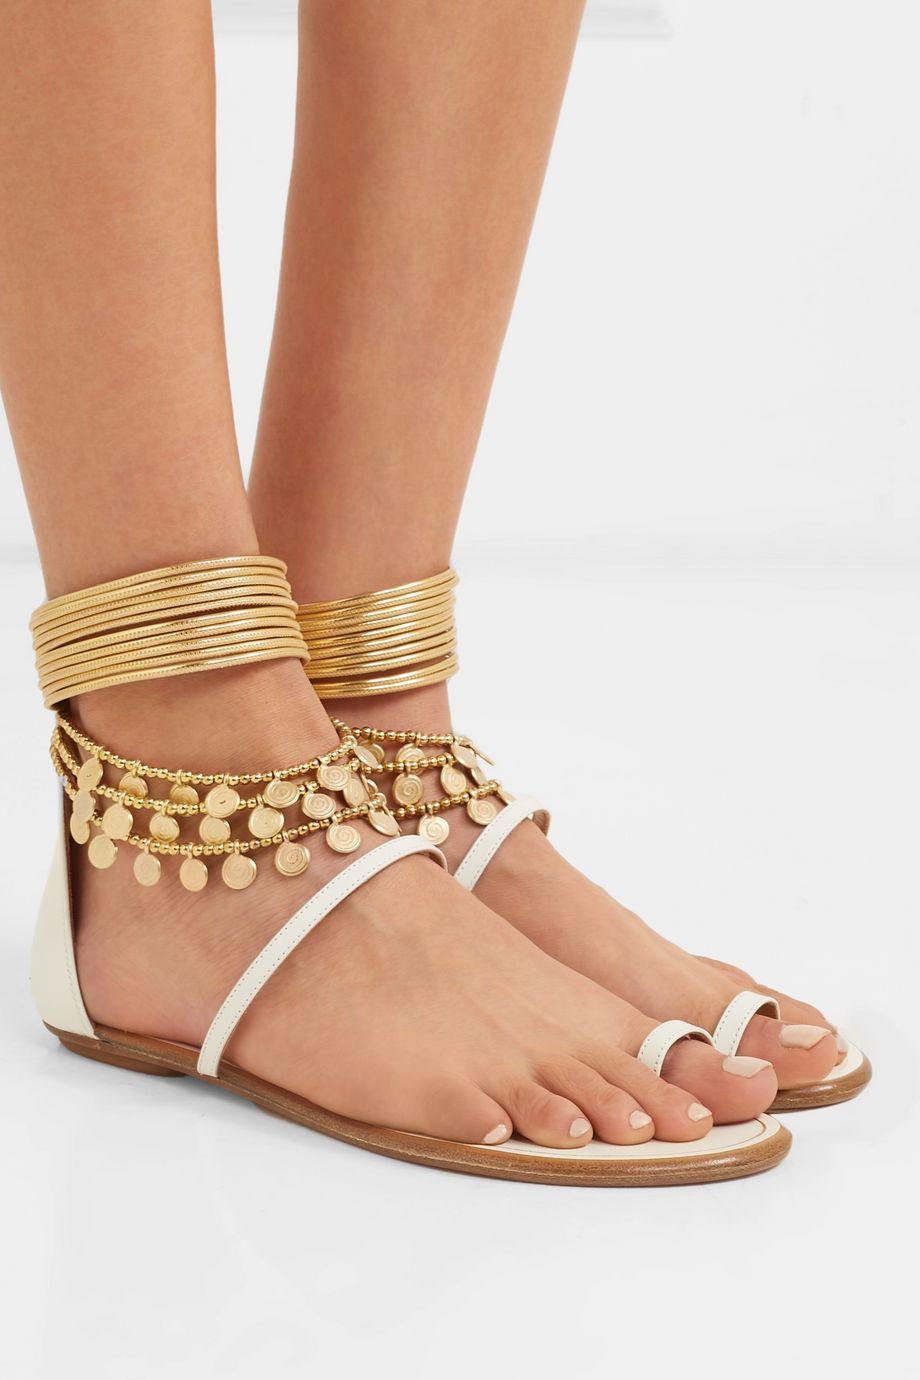 Aquazzura Queen Of The Desert embellished leather sandals